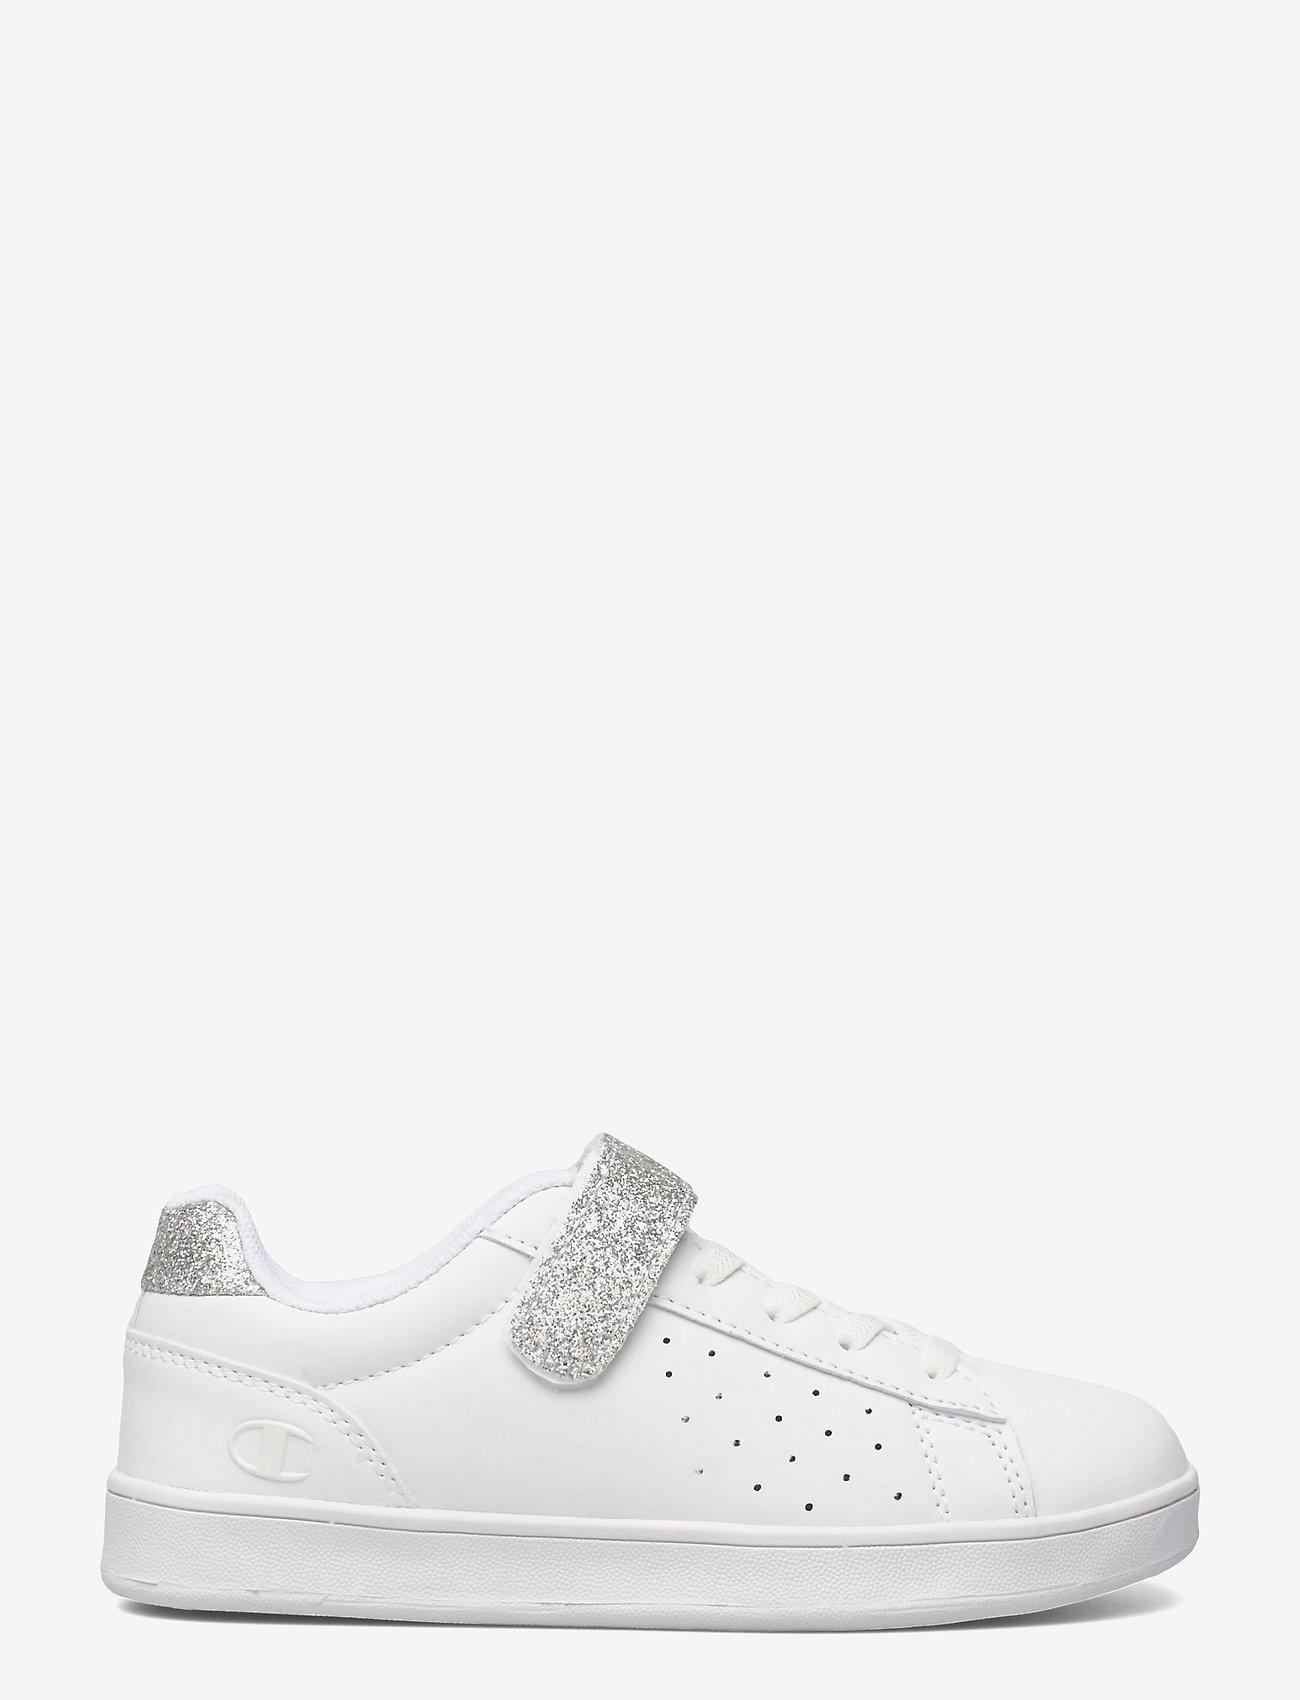 Champion - Low Cut Shoe ALEXIA G PS - niedriger schnitt - white e - 1